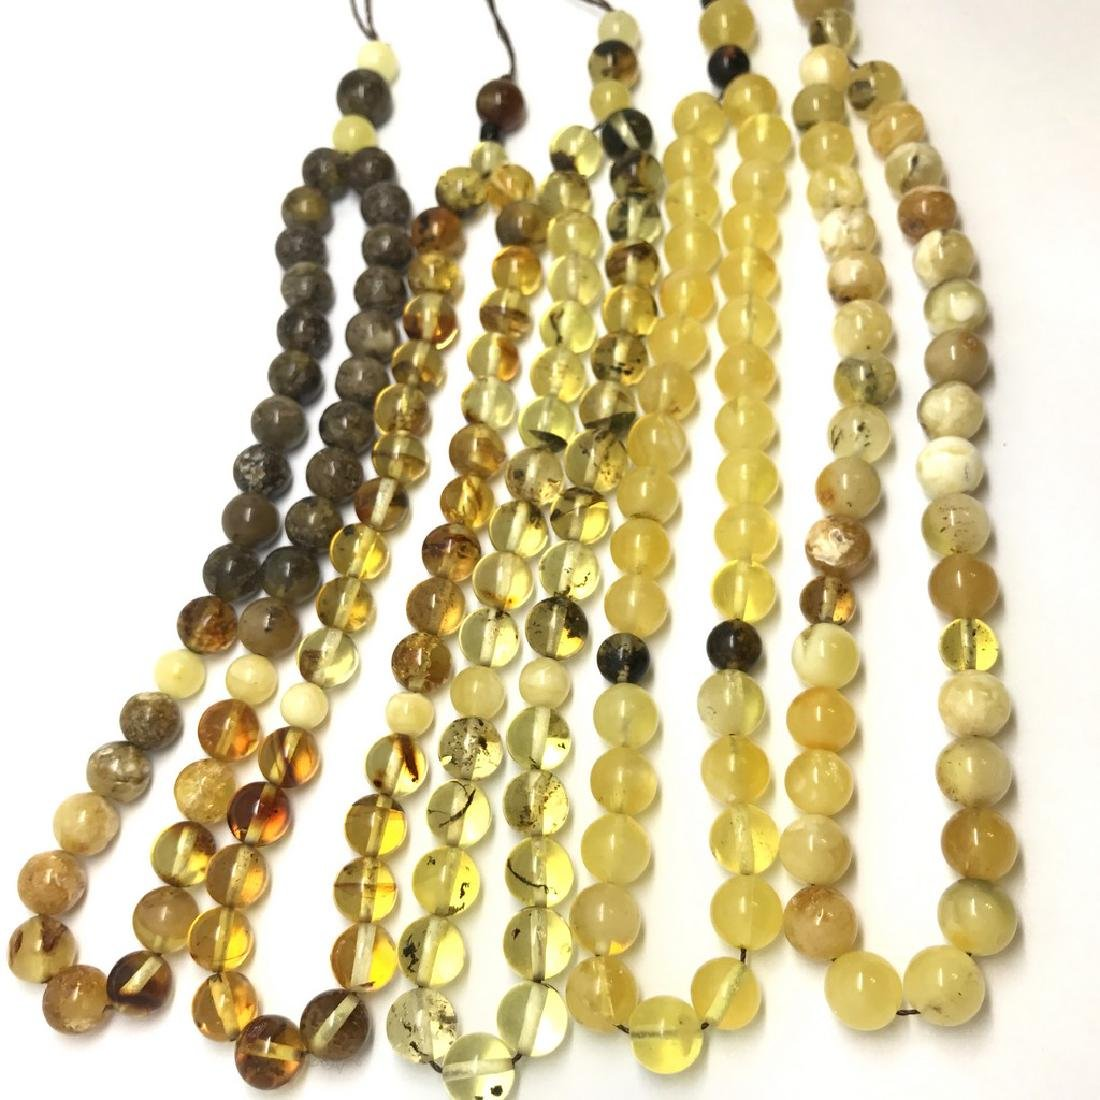 5x tesbih Baltic amber cherry 33 beads ø8-8.5mm 56.4 - 2